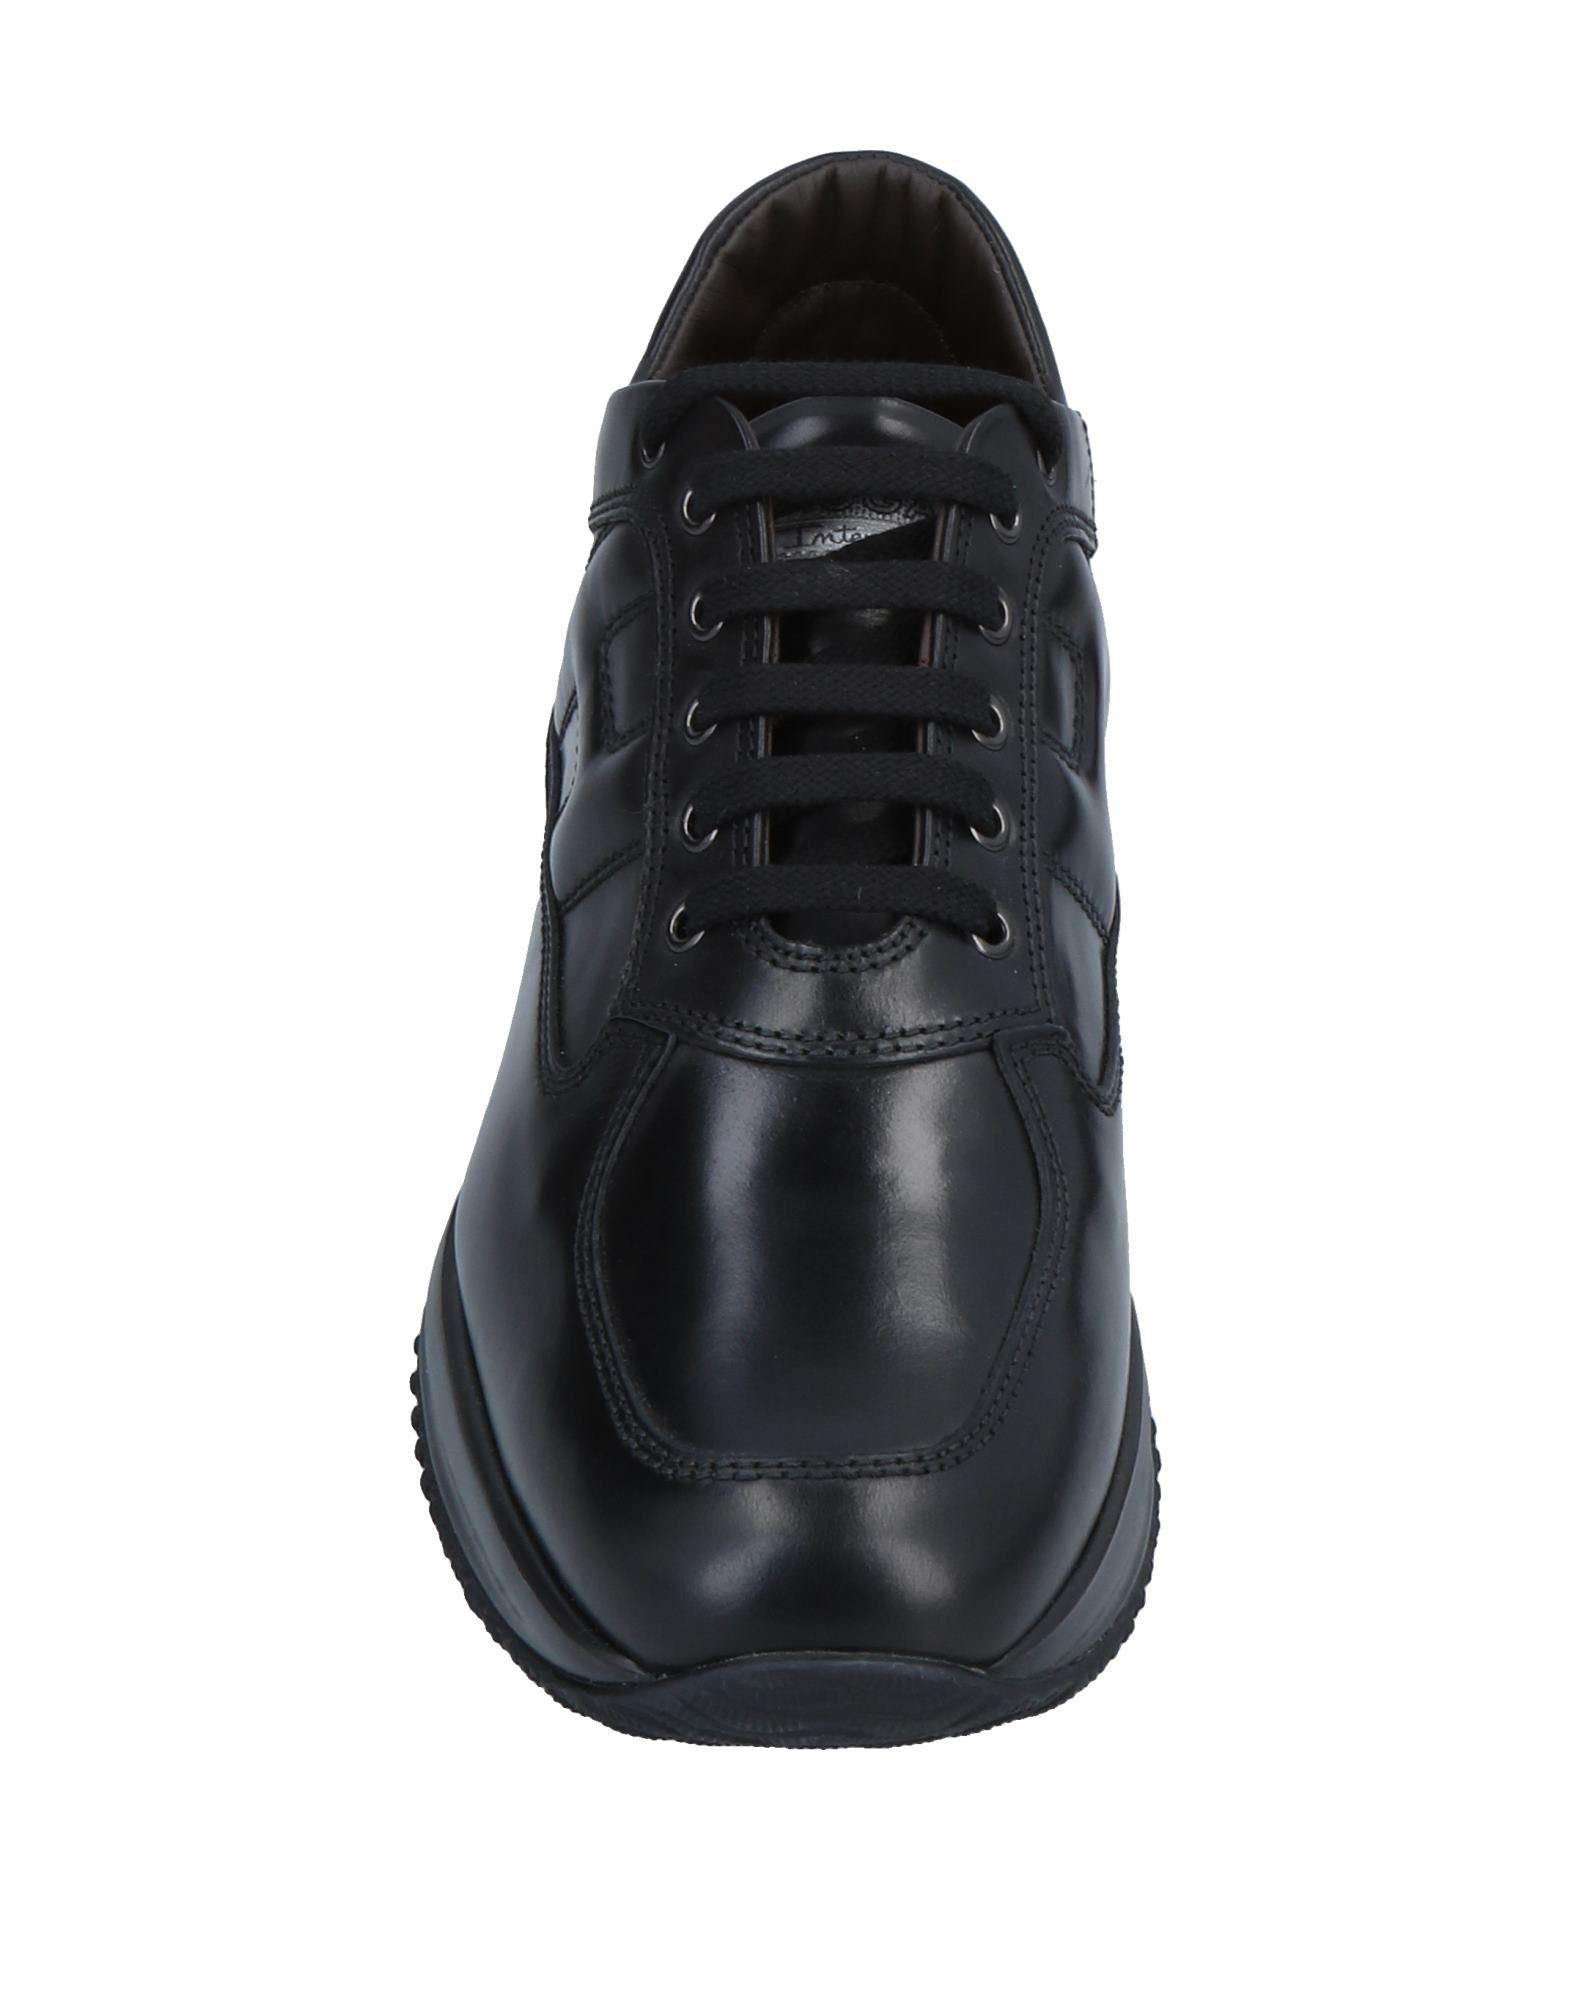 Hogan Sneakers Qualität Herren  11116164PT Gute Qualität Sneakers beliebte Schuhe dbb8f1